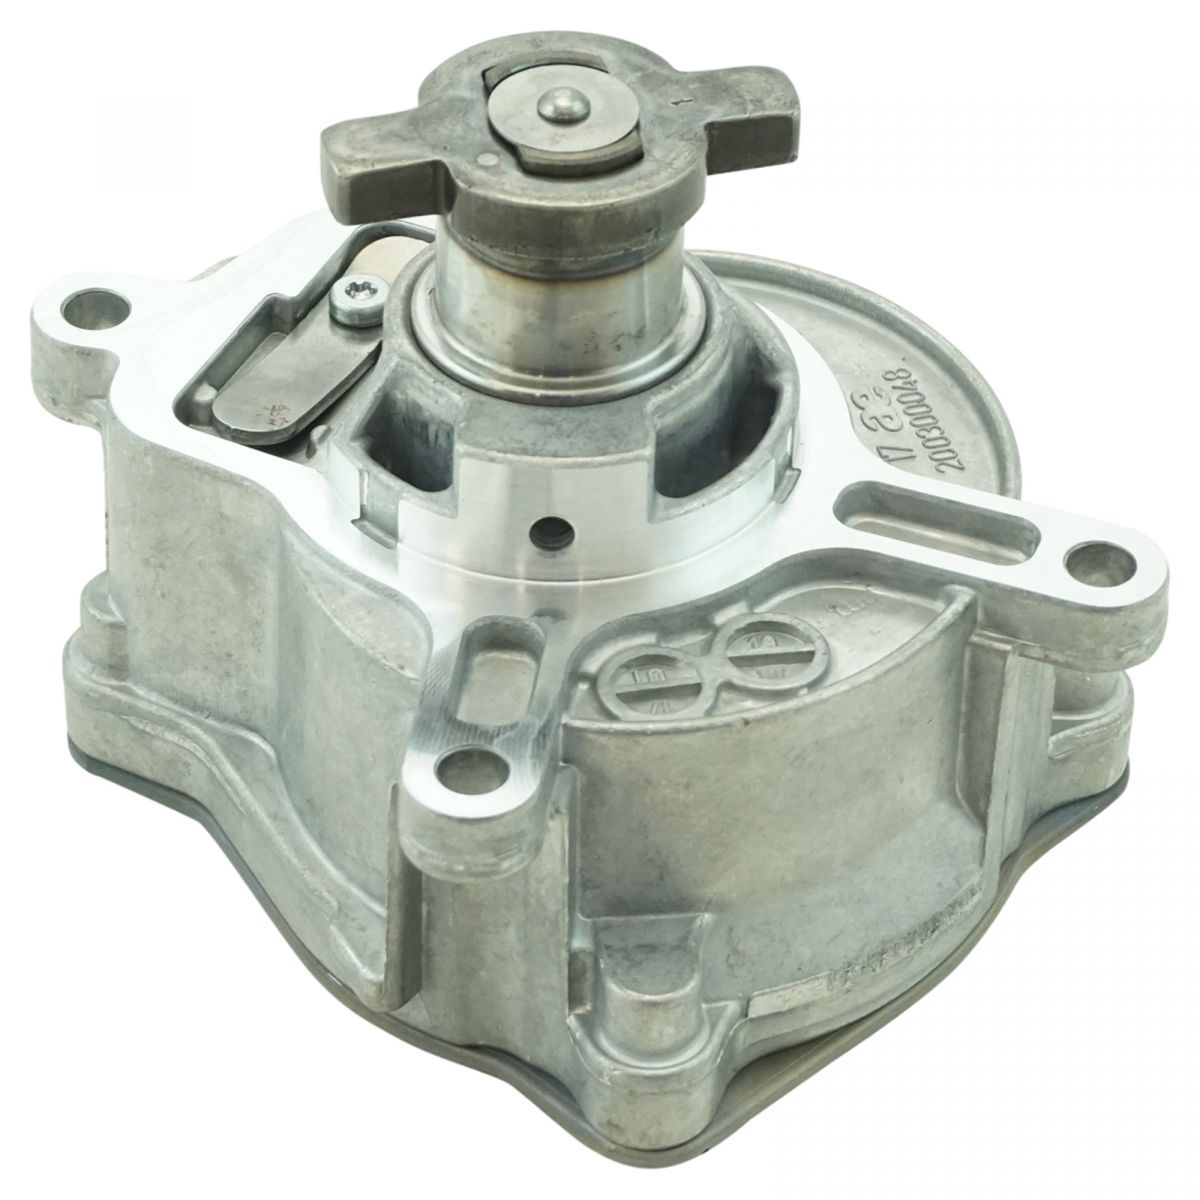 Dorman 904-817 Mechanical Vacuum Pump For Audi TT VW Golf